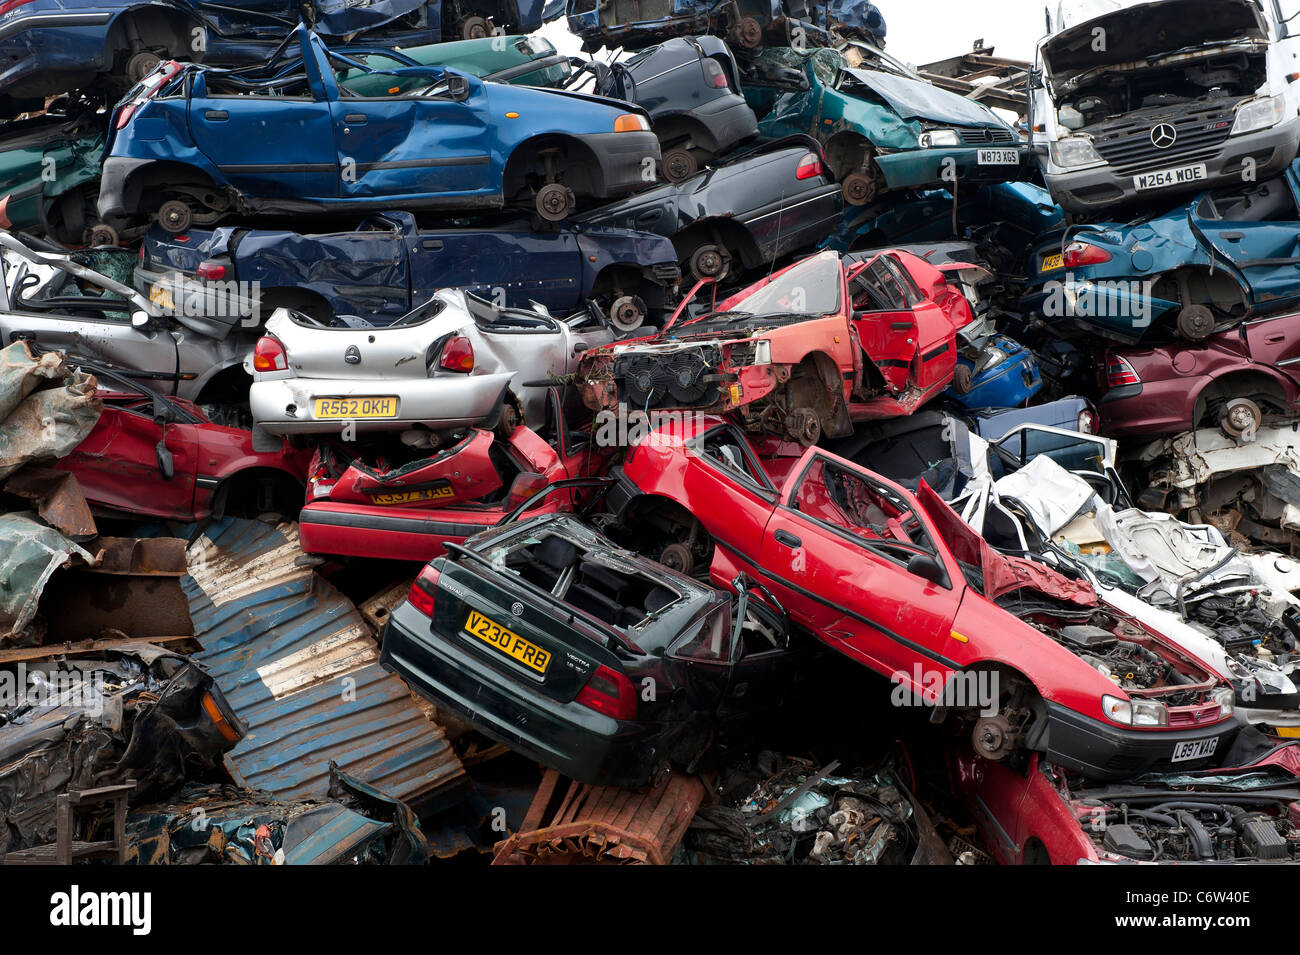 Crushed cars in scrap metal recycling yard in Malta Stock Photo ...